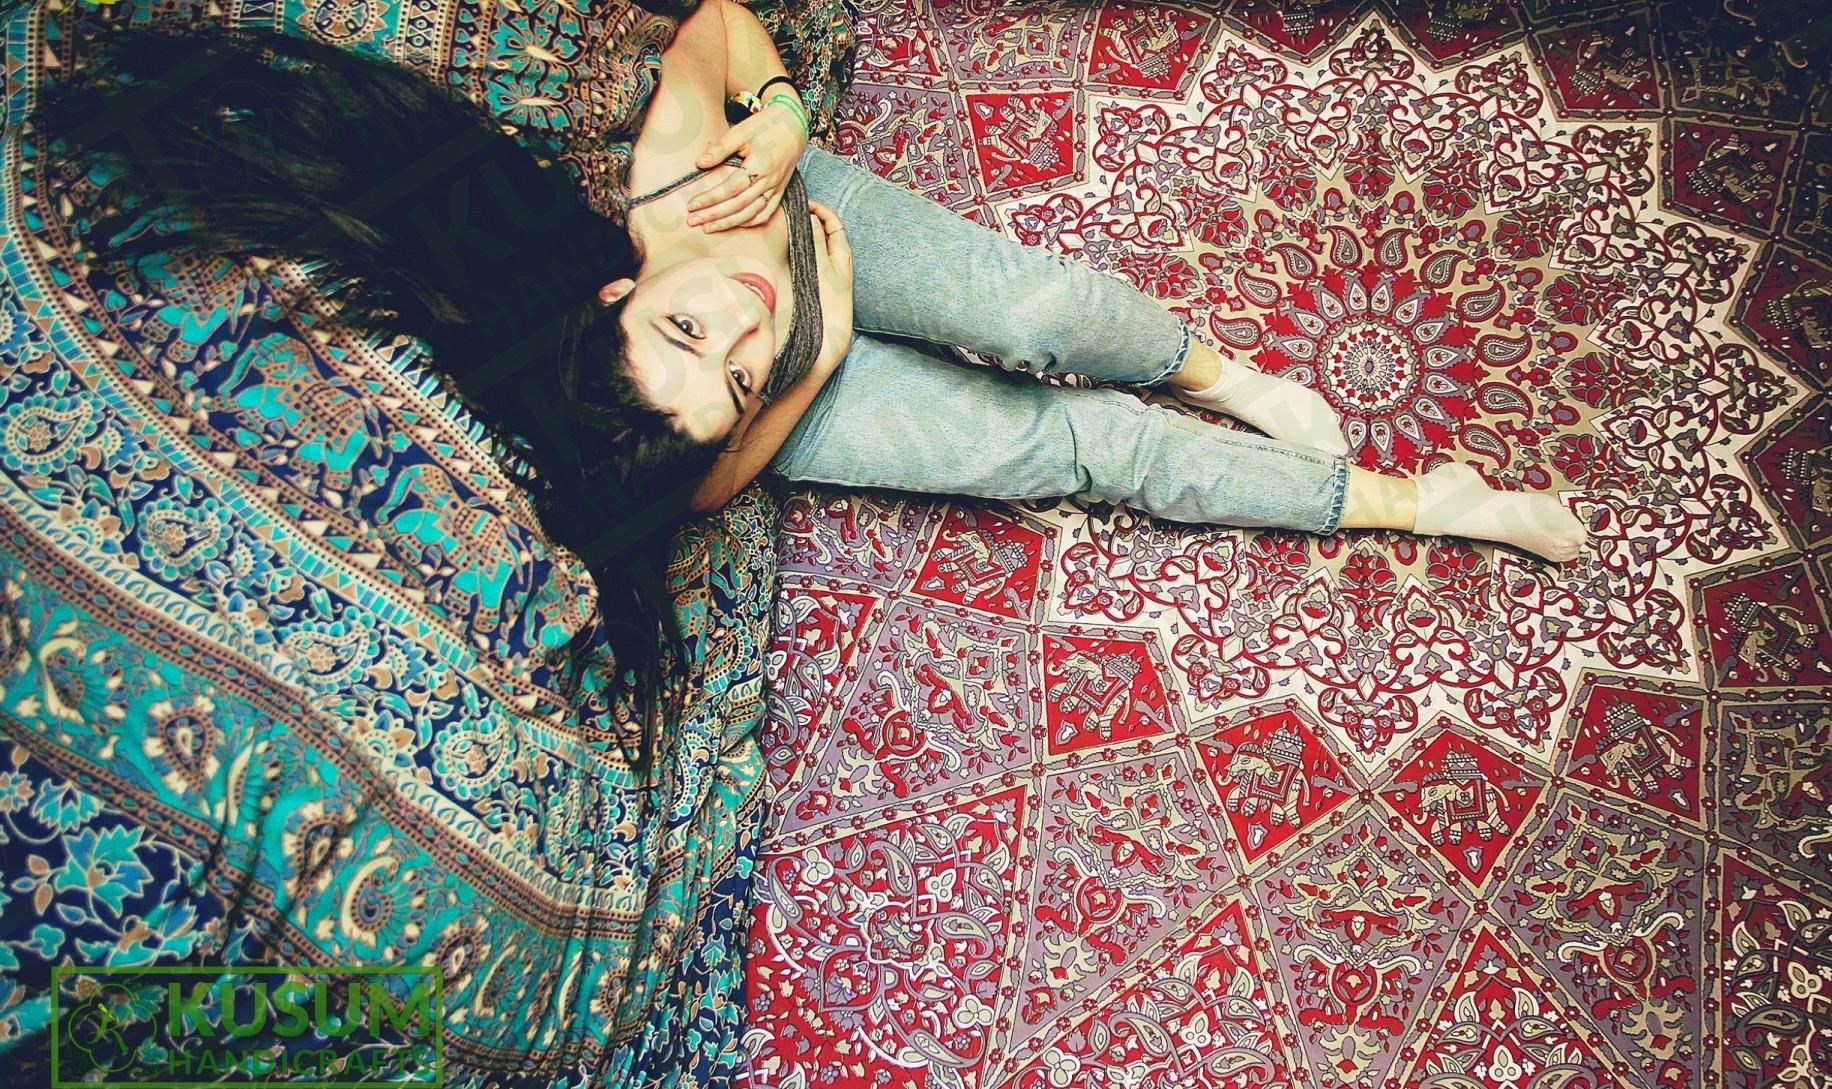 mandalatapestries-mandalatapestry-kusumhandicrafts-mandalawallhanging-khushvin-mandalatapestrymanufacturer